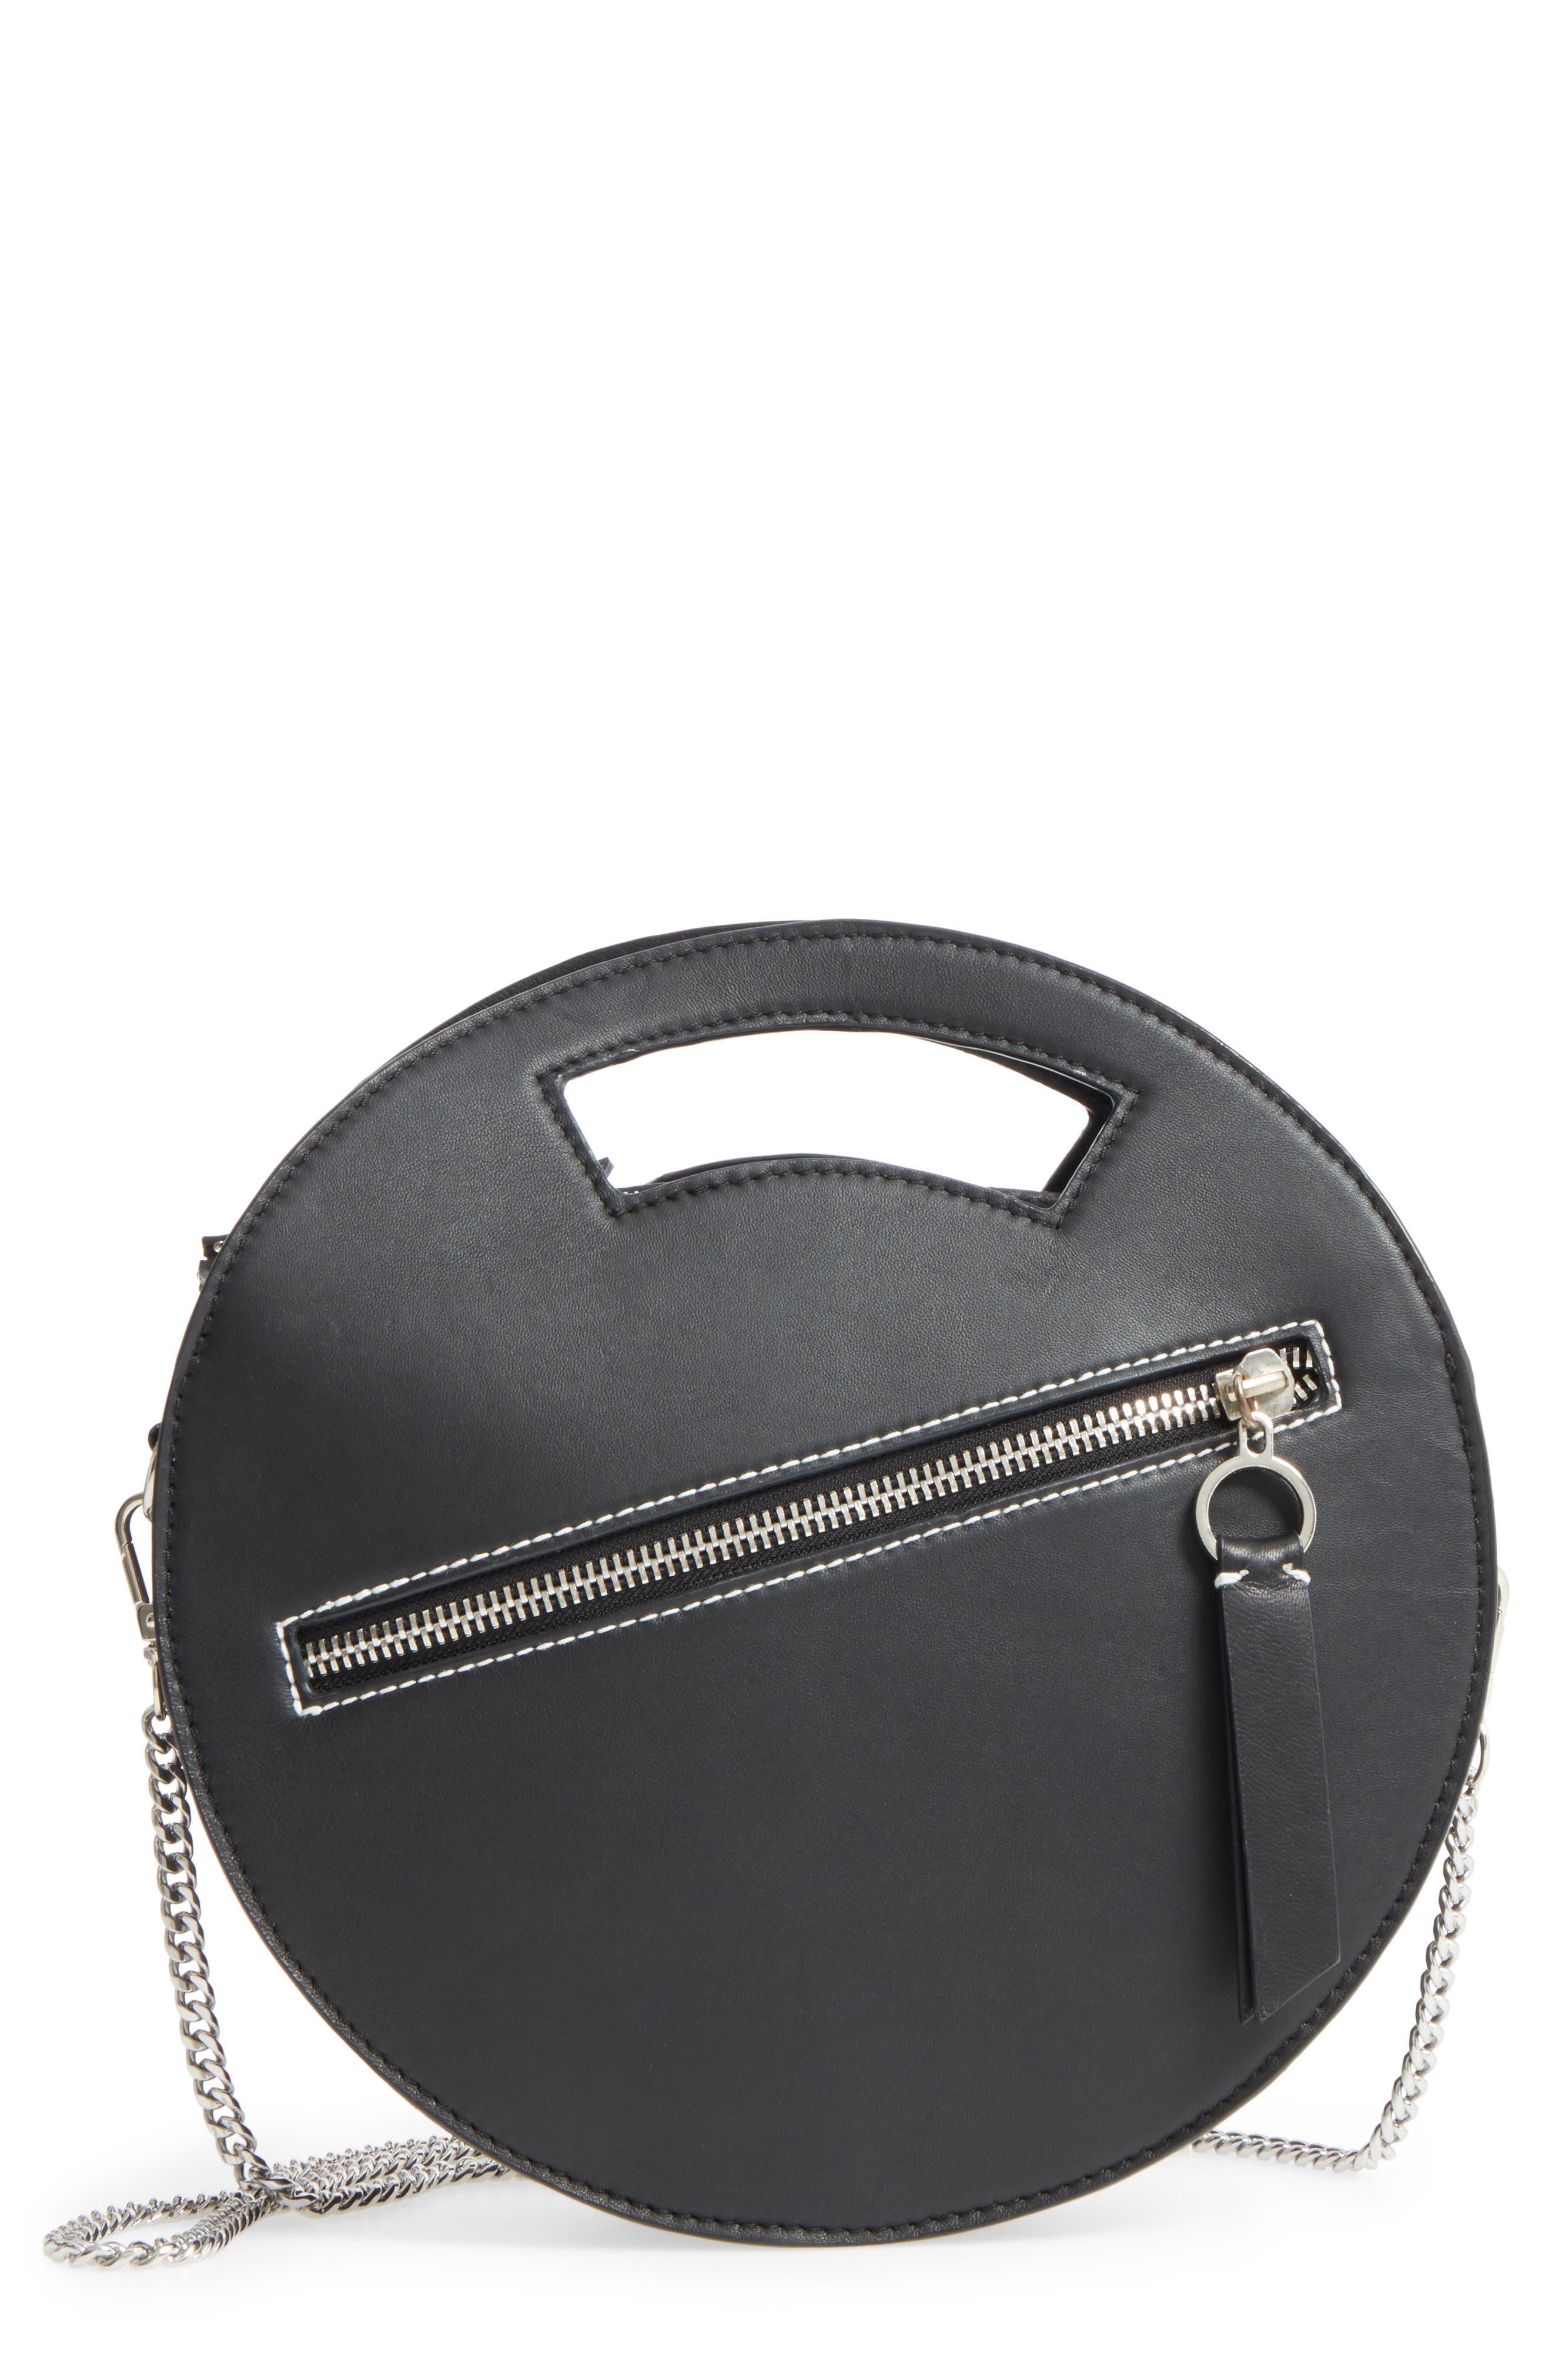 Topshop Premium Leather Circle Crossbody Bag